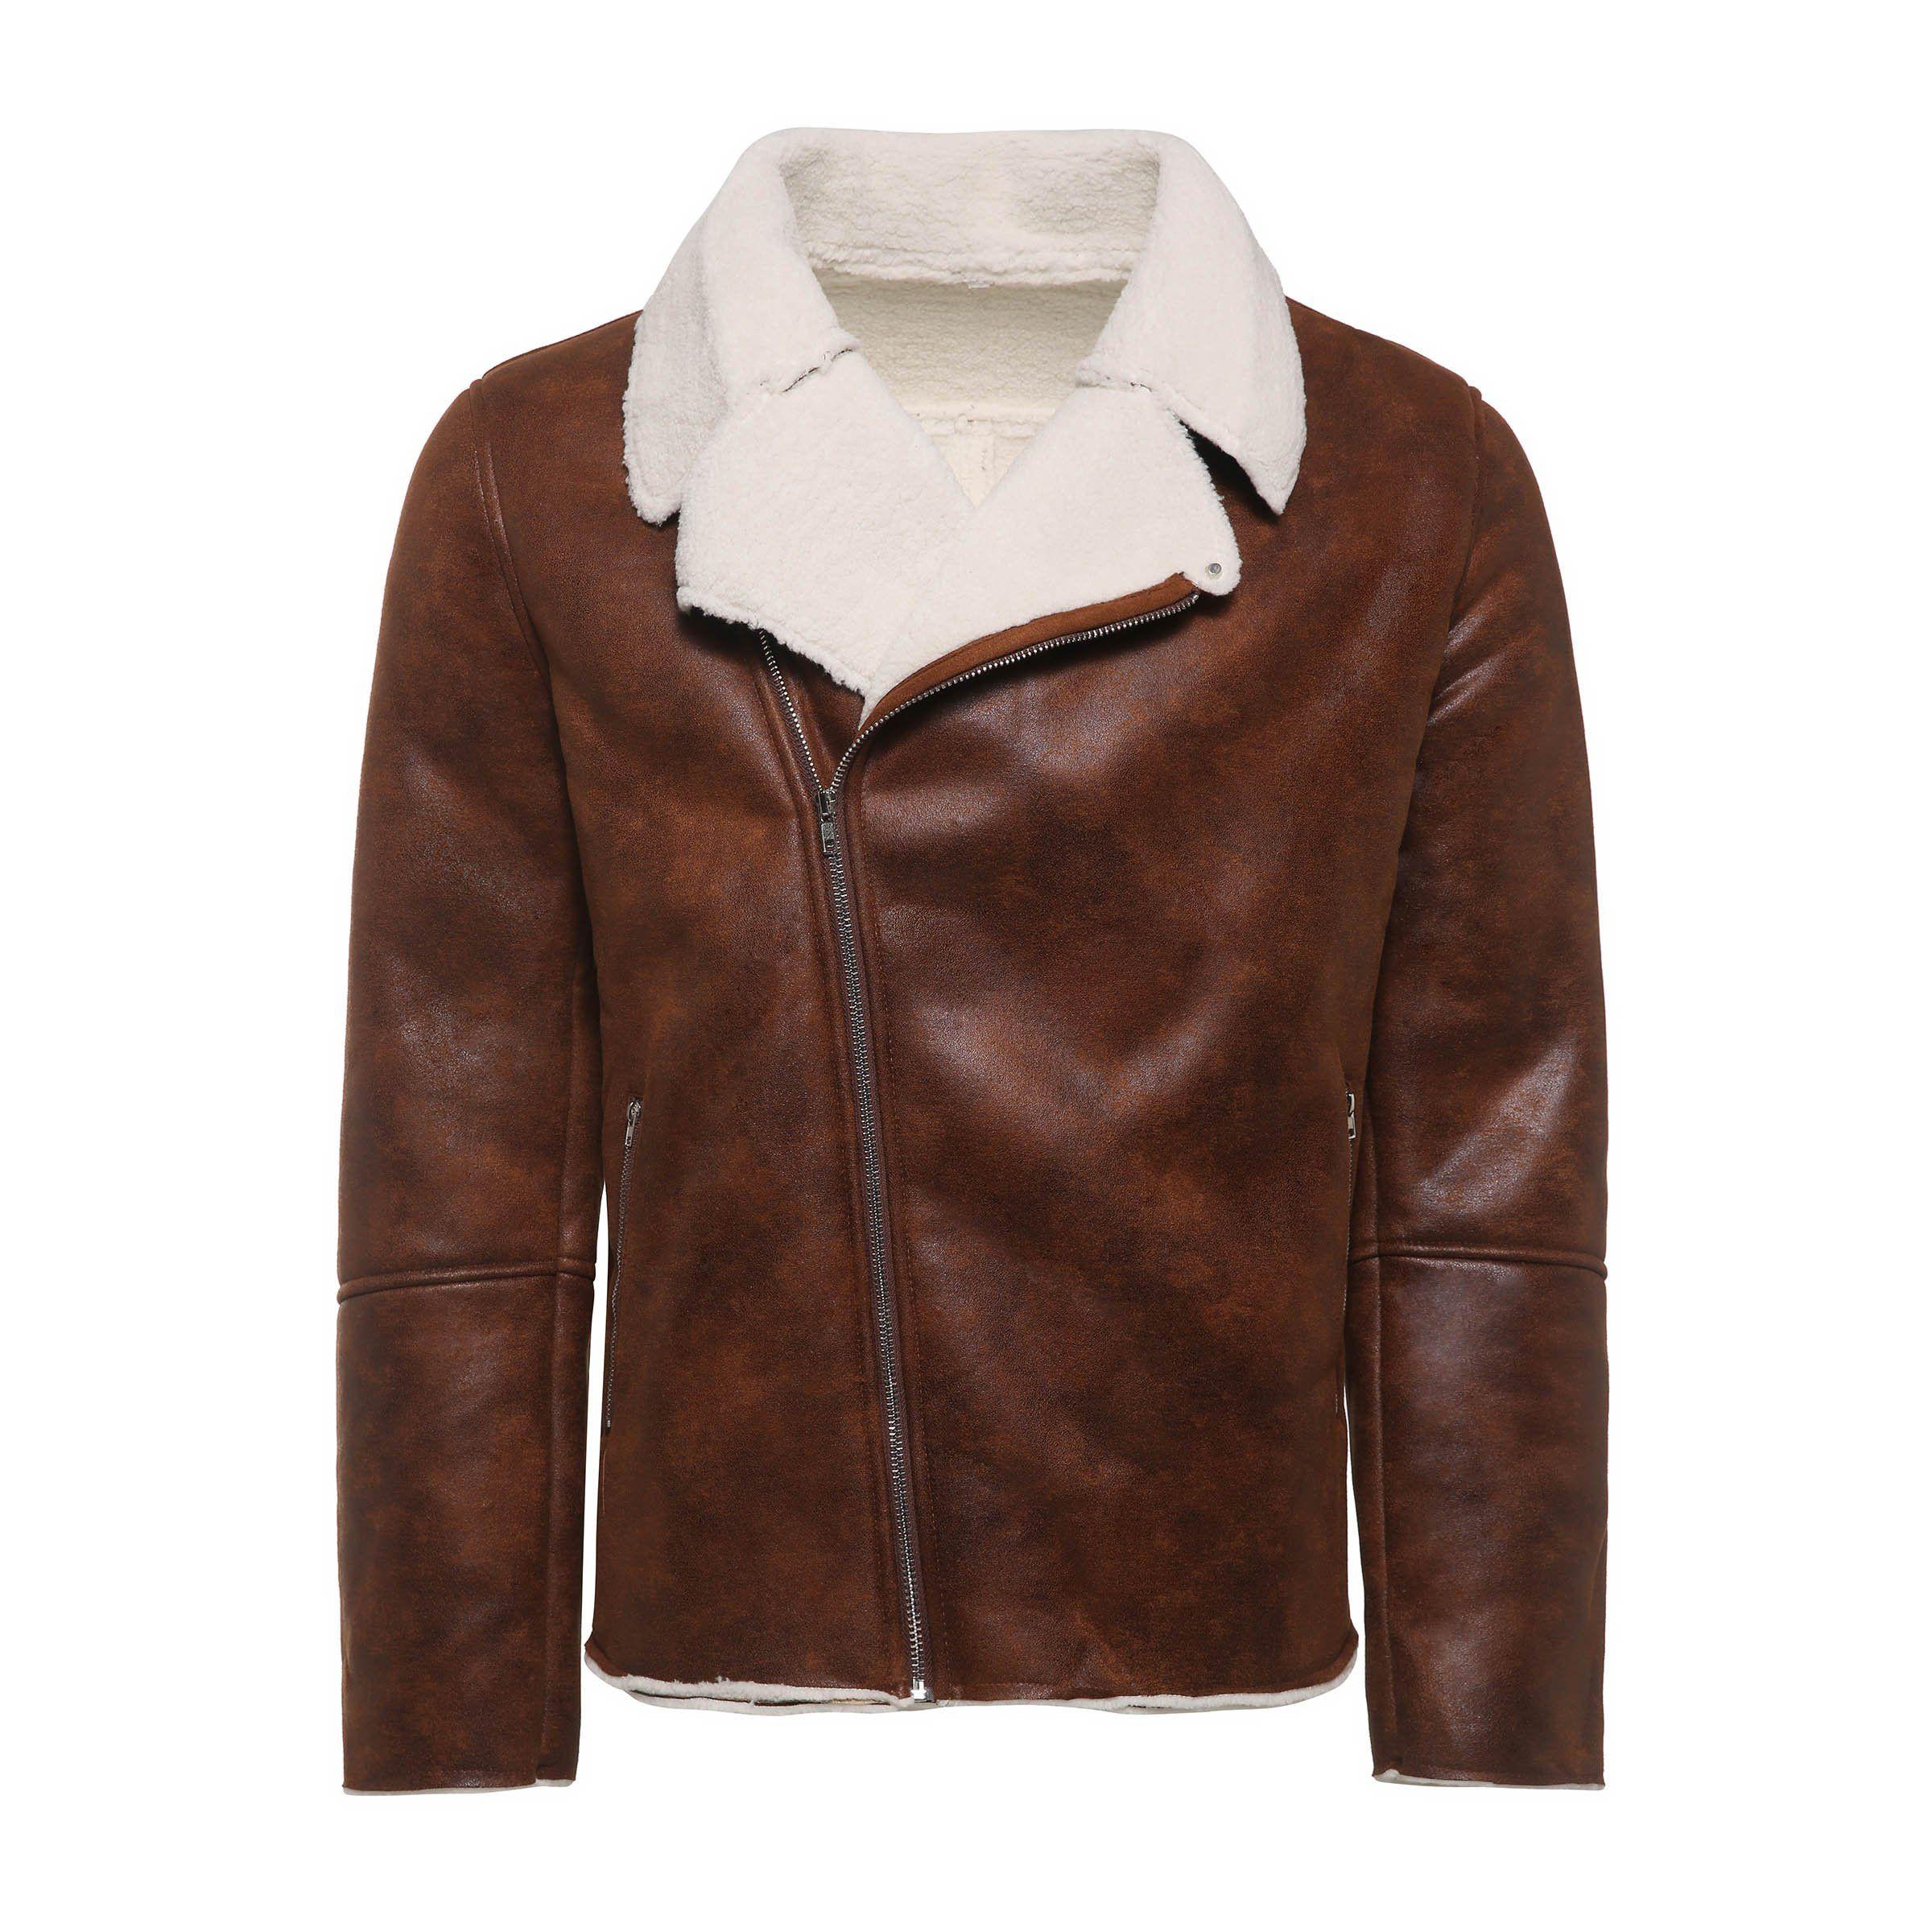 cobcob Womens Wool Outwear,Ladies Thick Jacket Zipper Drawstring Fleece Hoodies Winter Warm Coats